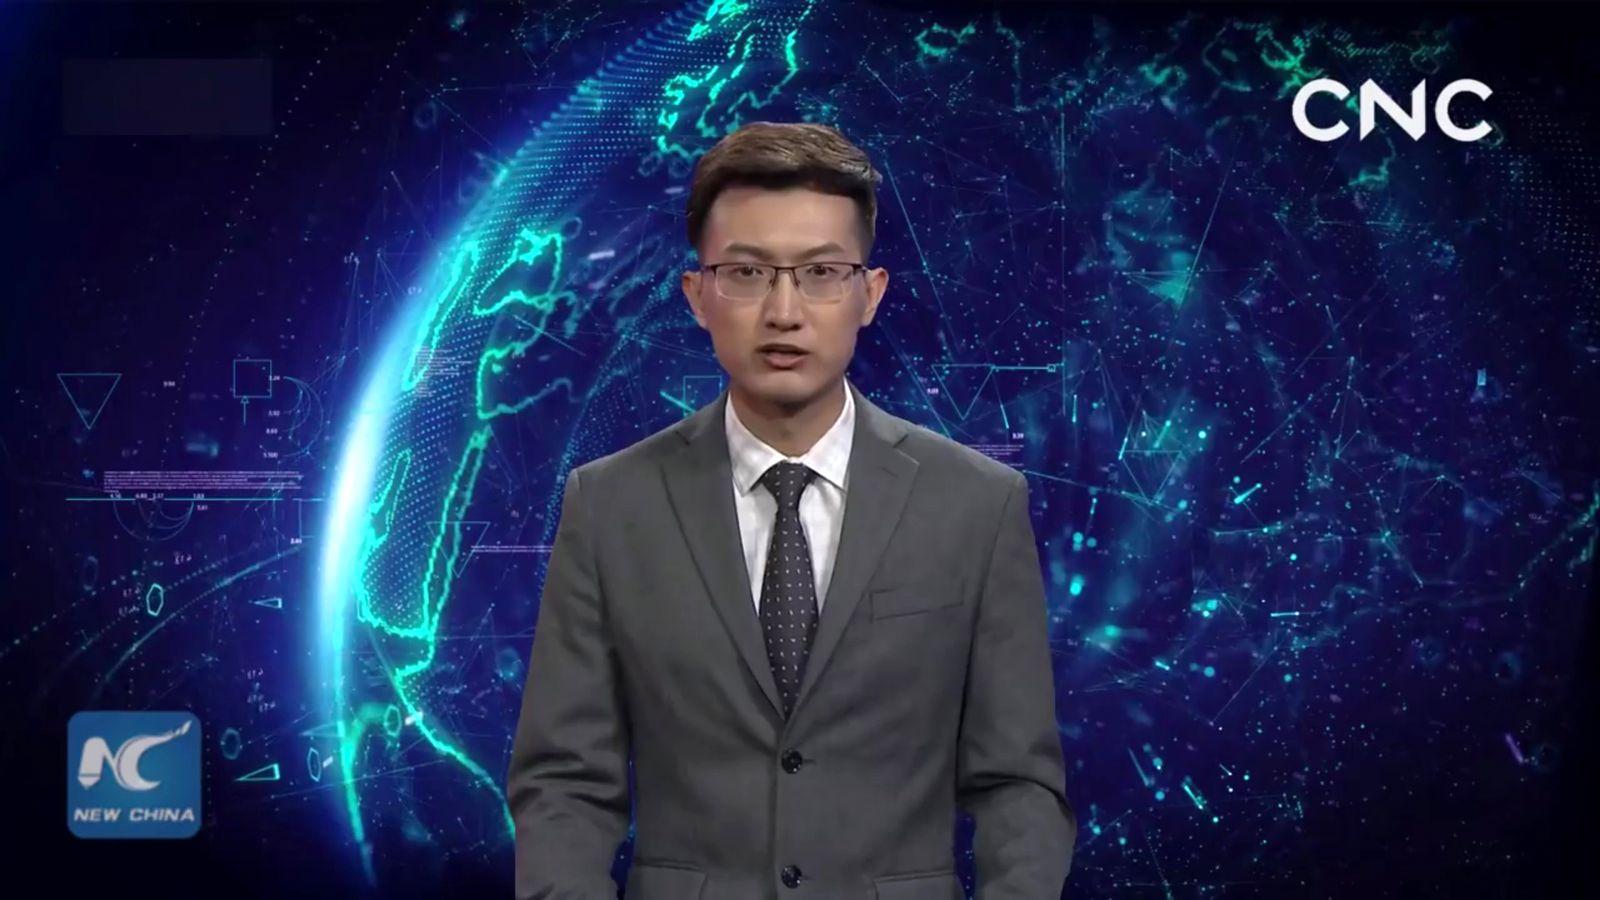 NUR ALS ZITAT Screenshot Xinhua/ KI-Nachrichtensprecher